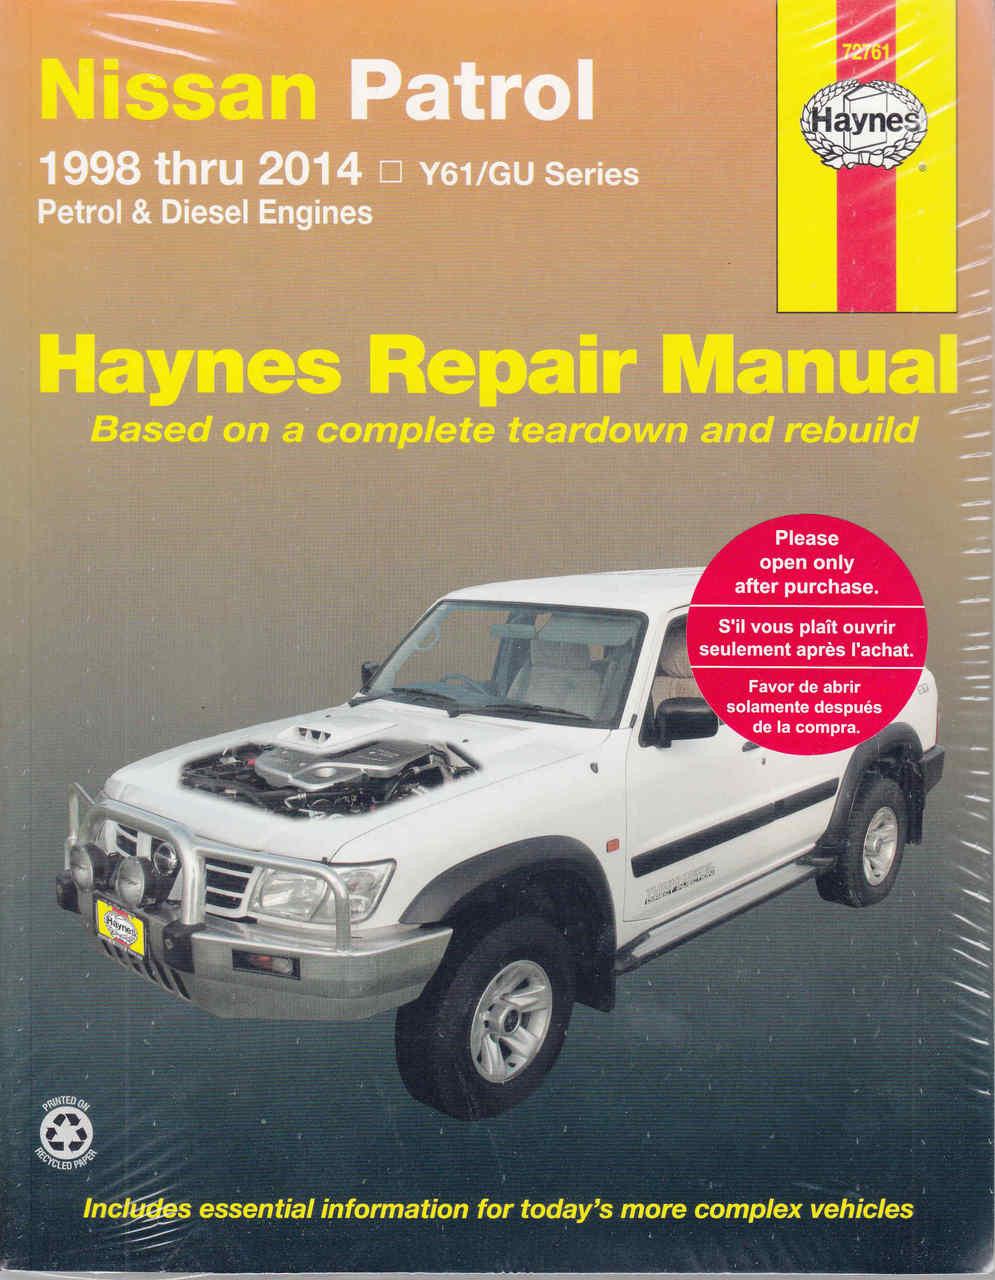 nissan patrol gu series petrol diesel 1998 2011 workshop manual rh automotobookshop com au Old Nissan Patrol Nissan Patrol G60